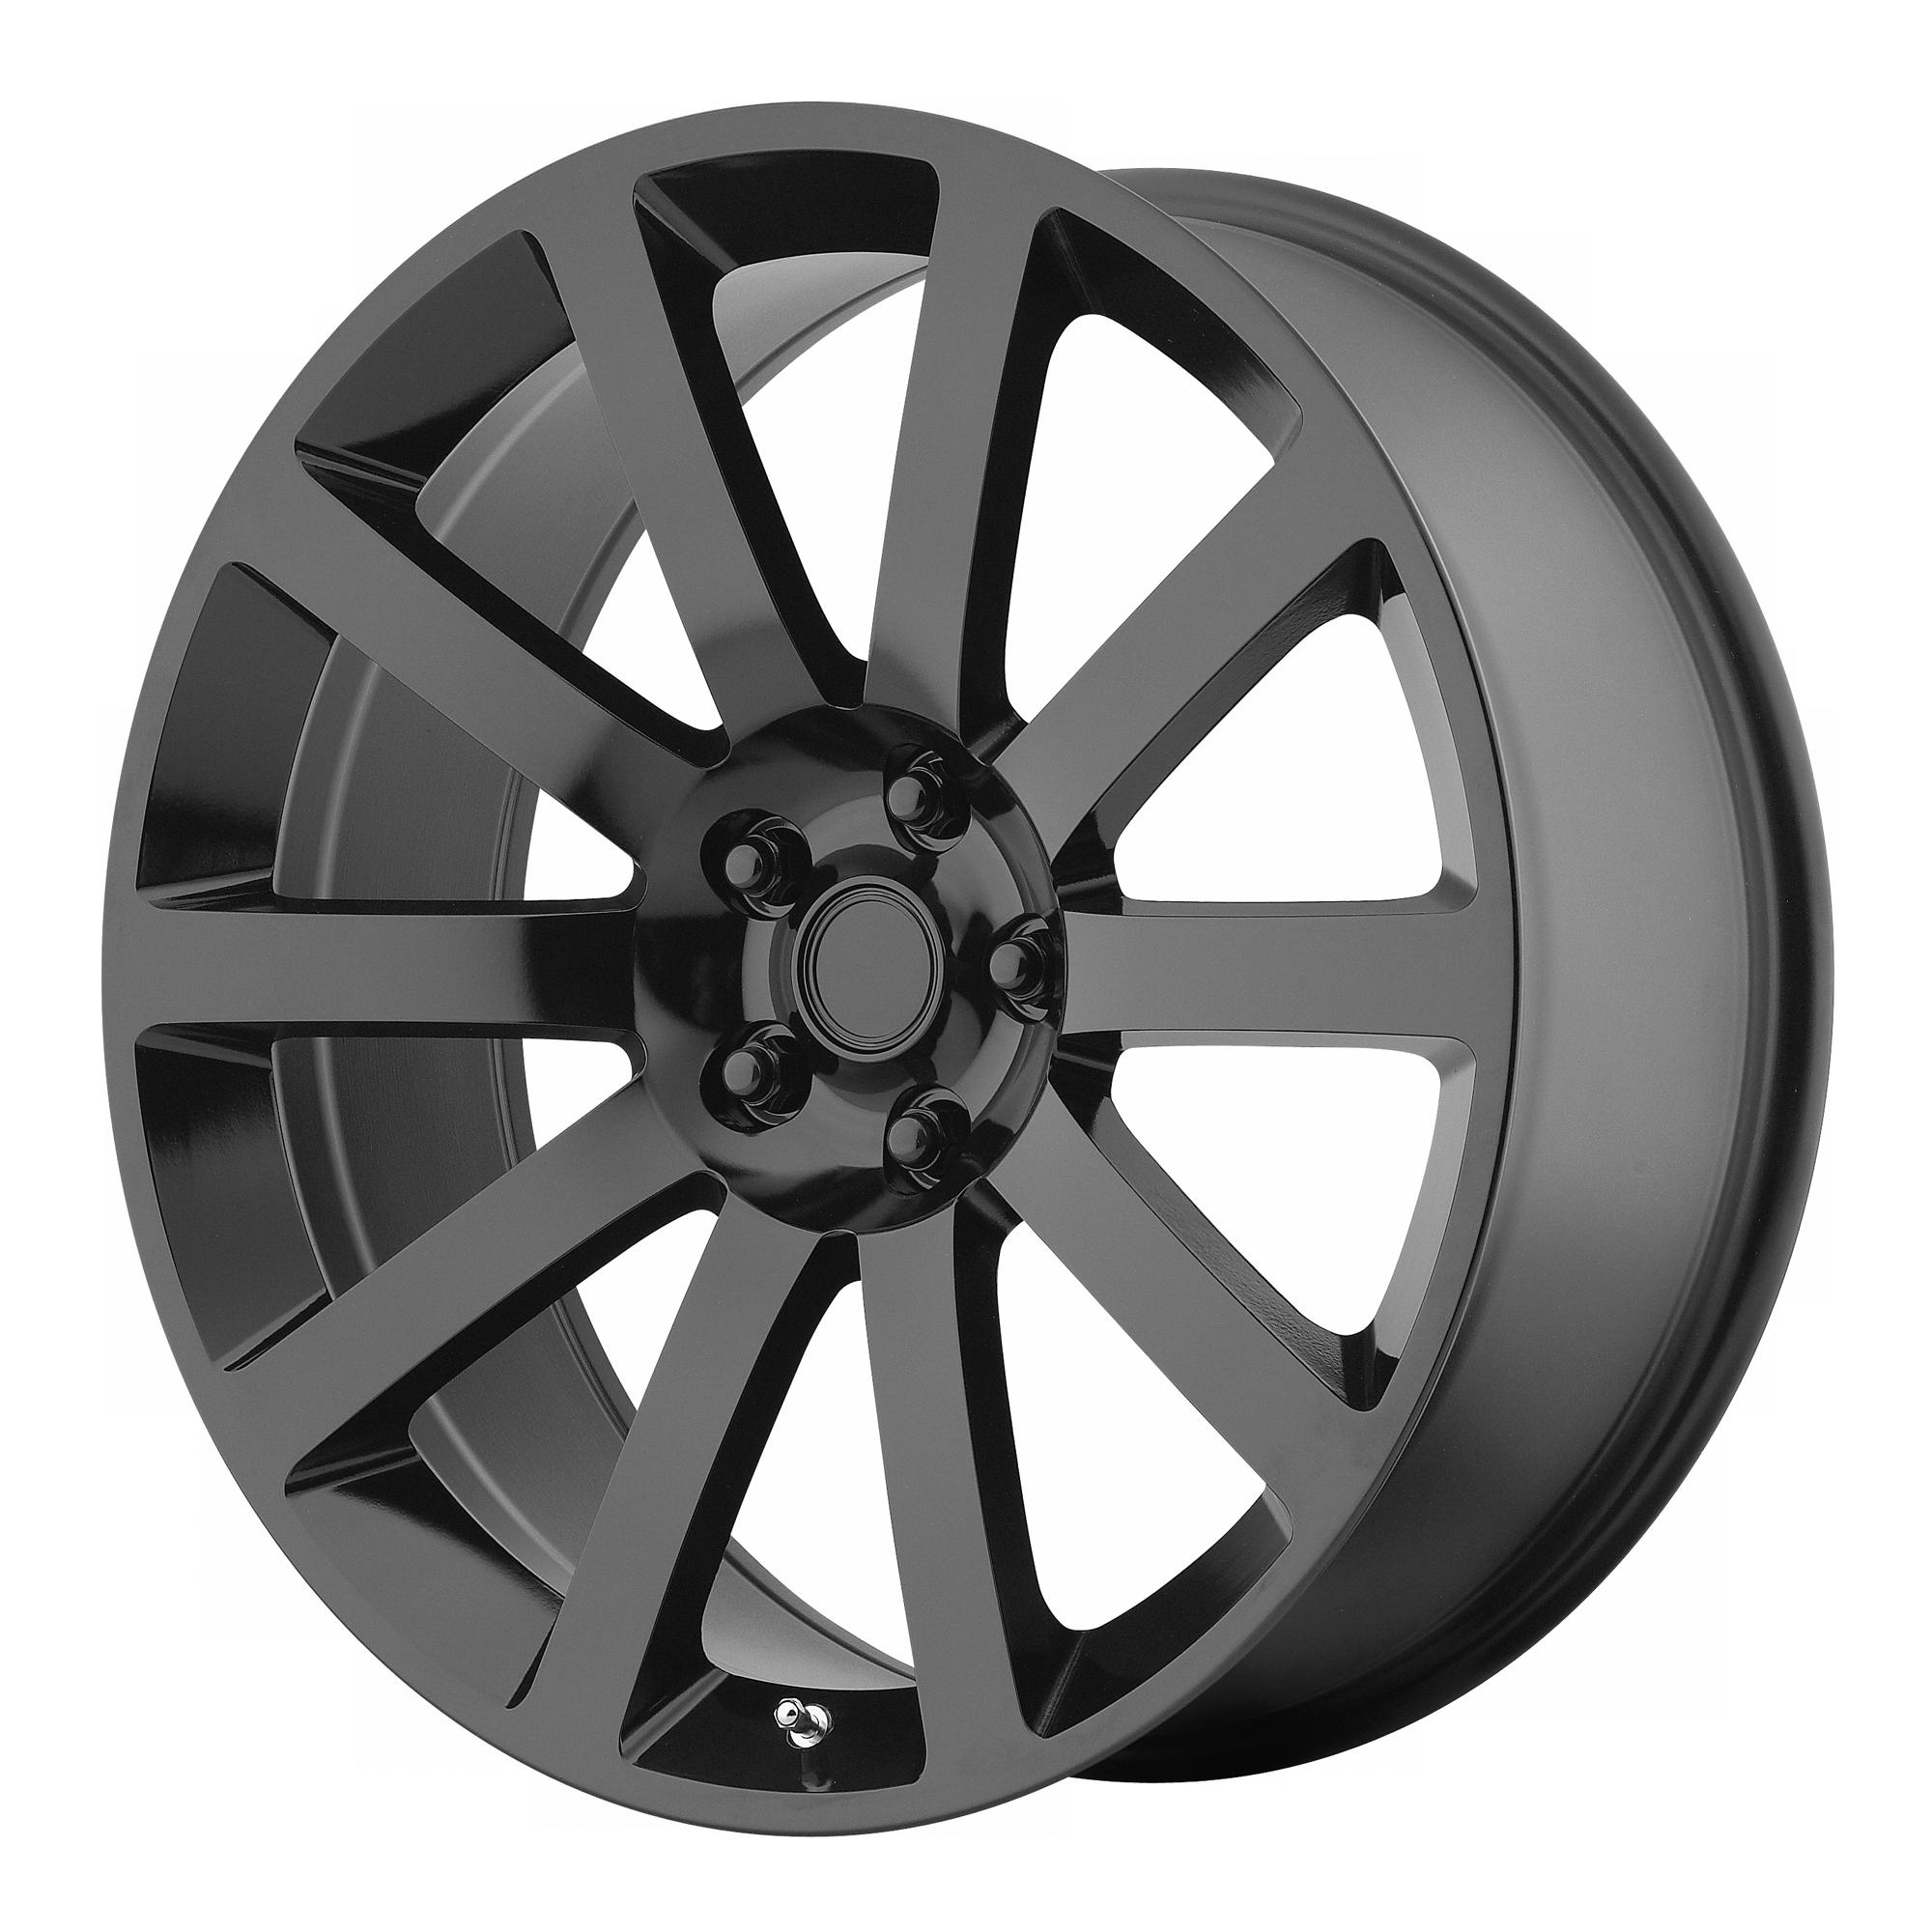 OE Creations Replica Wheels OE Creations PR146 Gloss Black